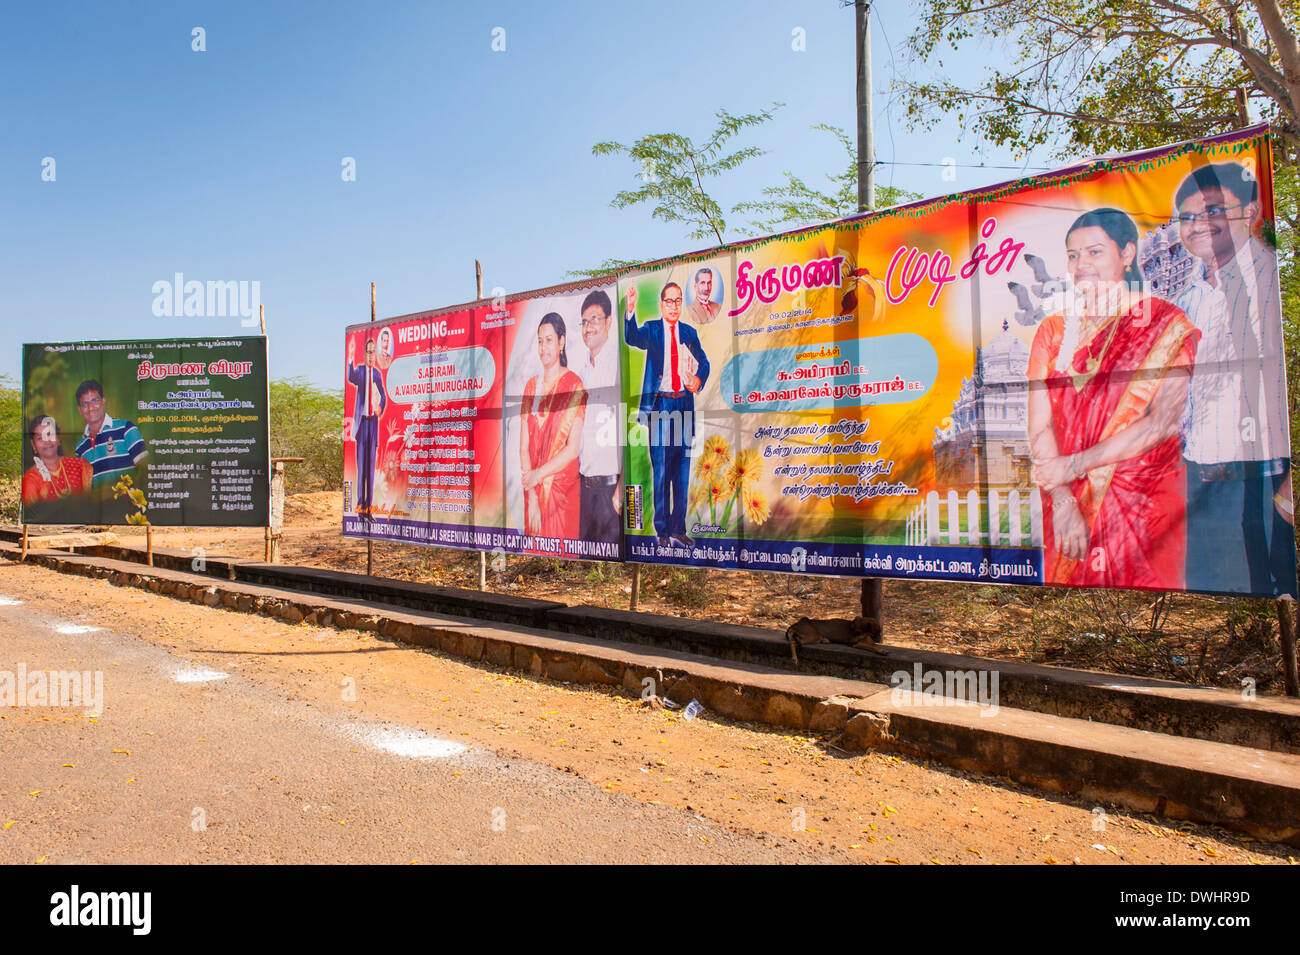 South Southern India Tamil Nadu Chettinad Karakaikudi wedding home family photo names posters poster billboards bill boards street scene - Stock Image